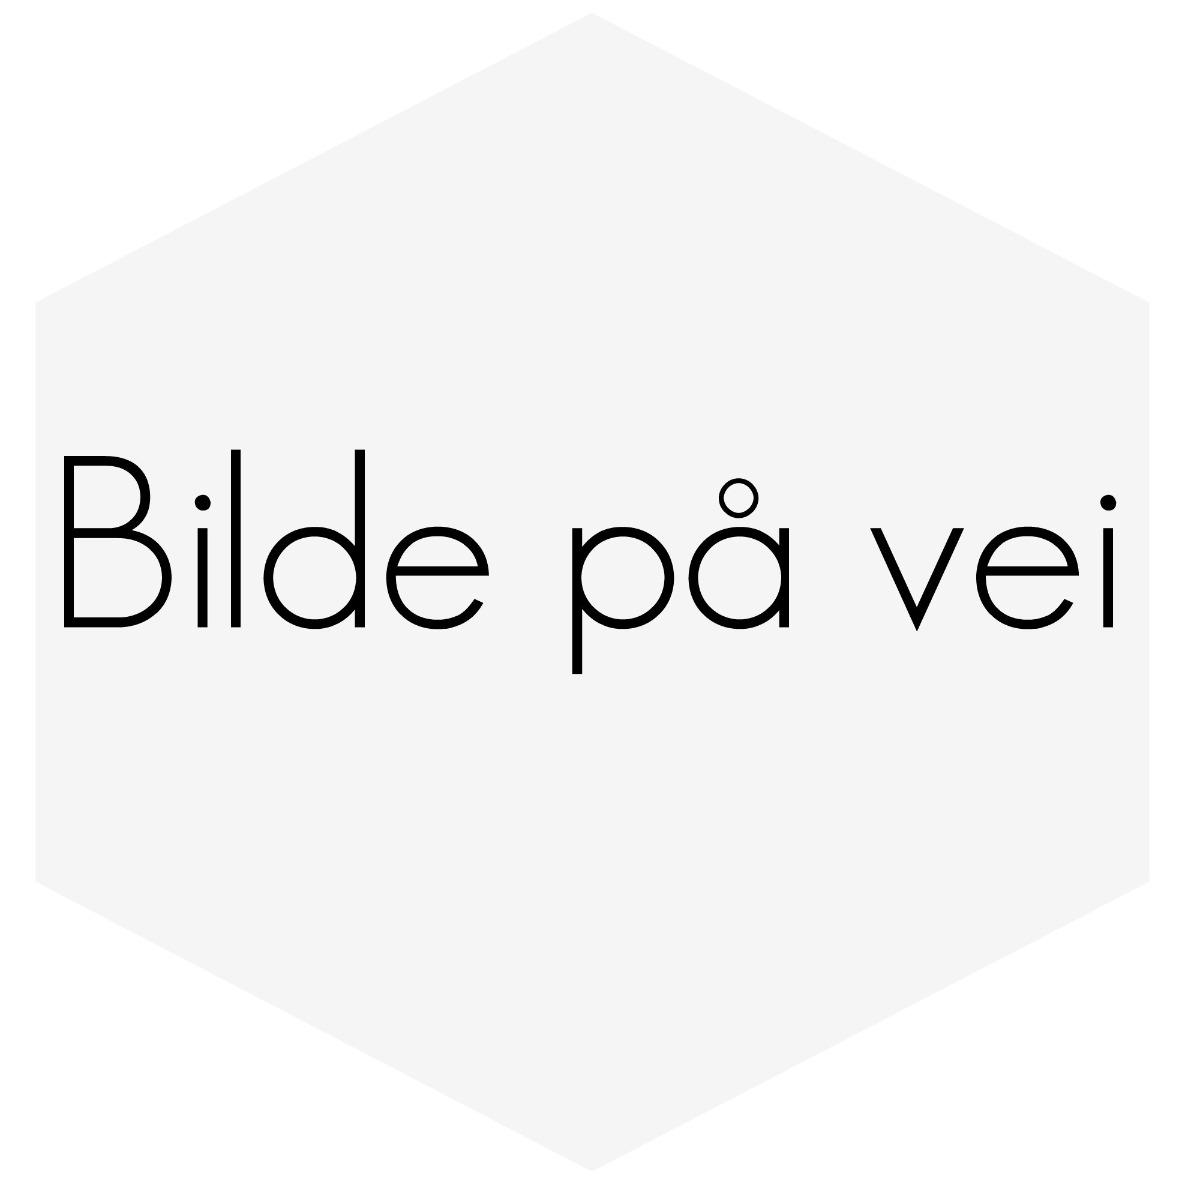 SILIKONSLANGE ARMERT BLÅ 0,375'' (9,5MM),pris pr meter